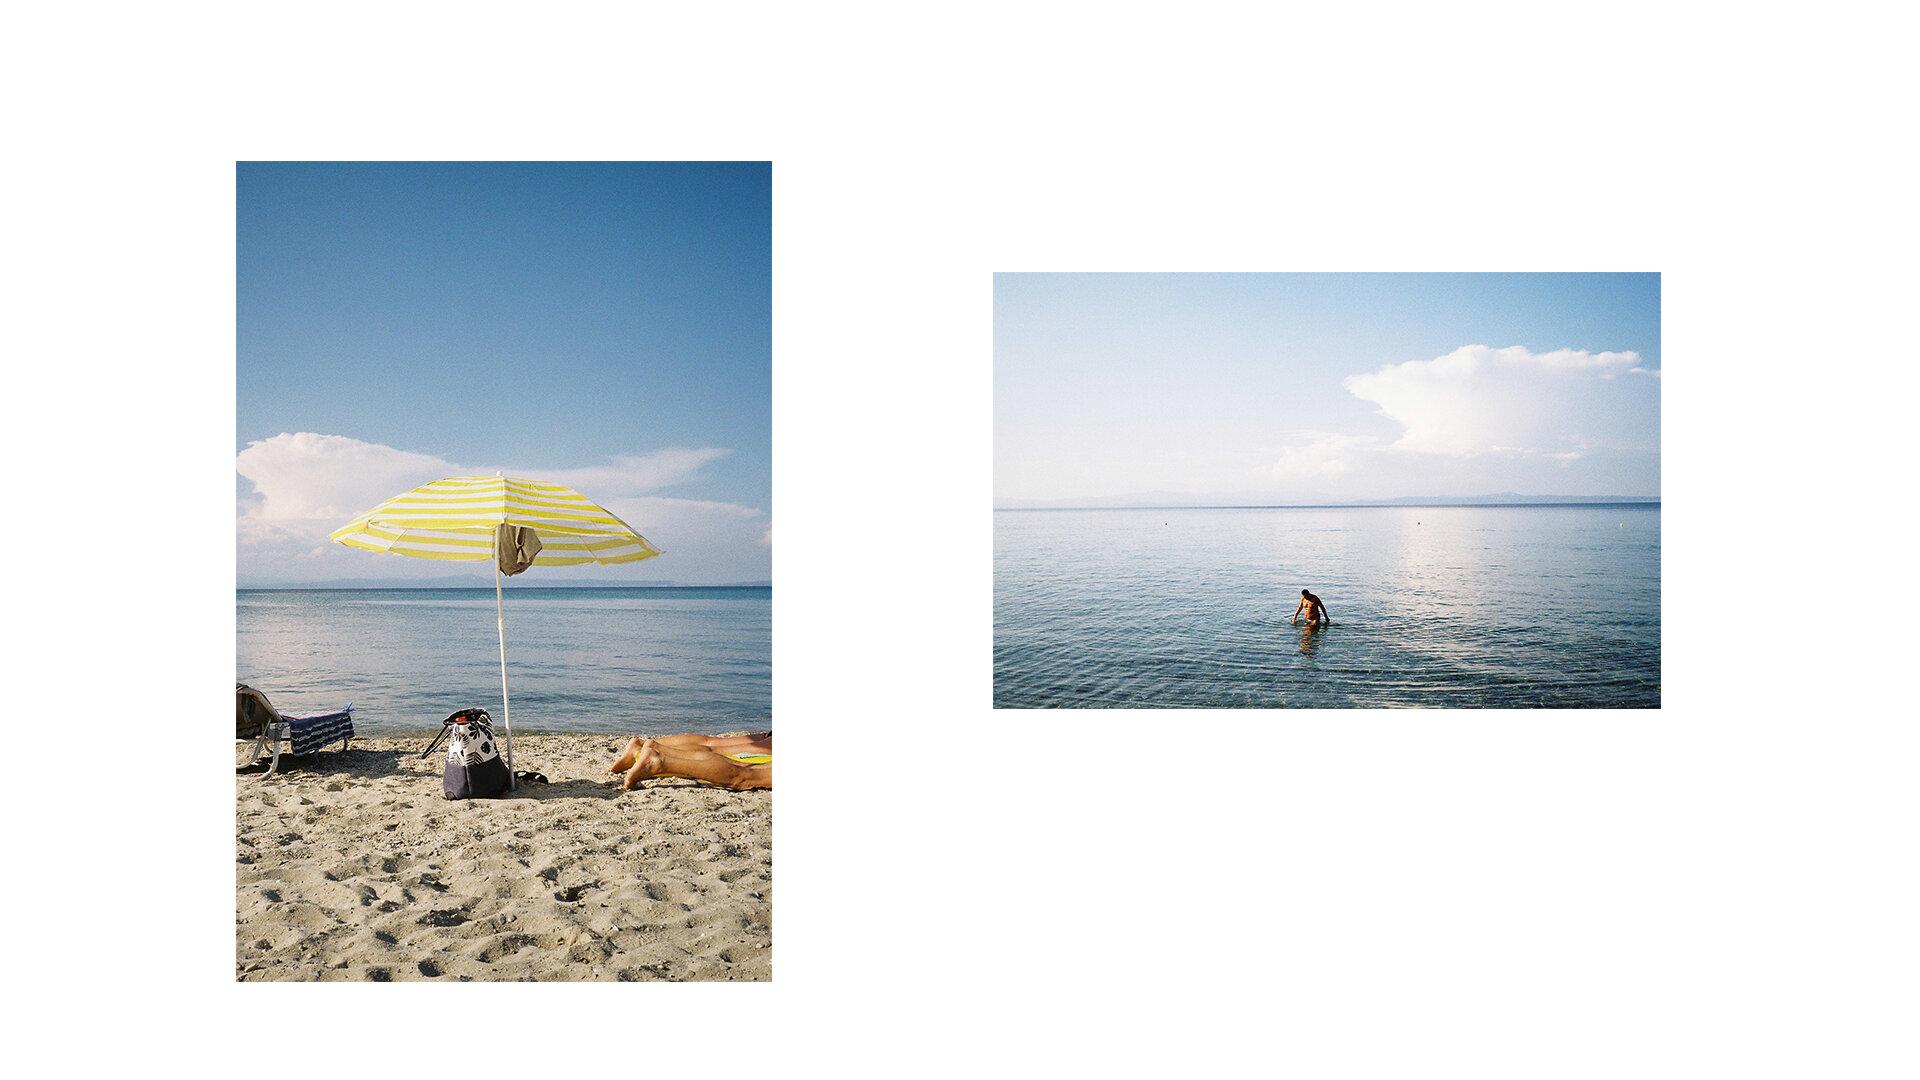 toby-butler-photo-tobybutlerphoto-lifestylephotography-travel-travelphotography-lifestyle-tourism-greece-film-35mm-magazine-europe-mediterranean-ocean-5.jpg